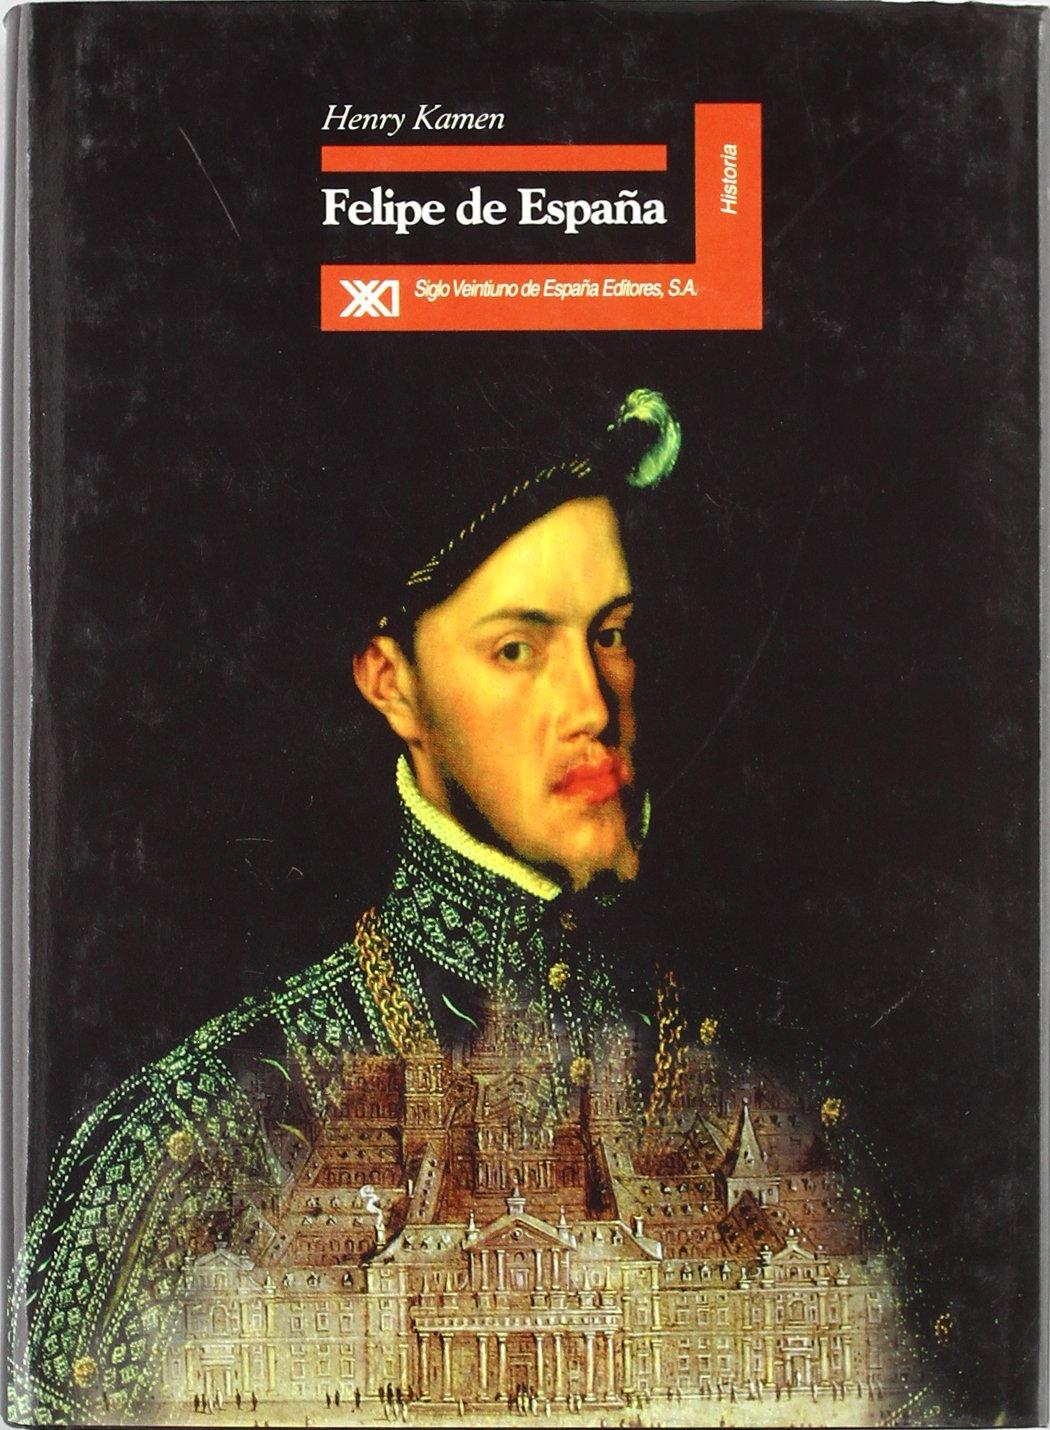 Felipe de España: Amazon.es: Kamen, Henry, Arjona, Pedro, Escandón, Patricia: Libros